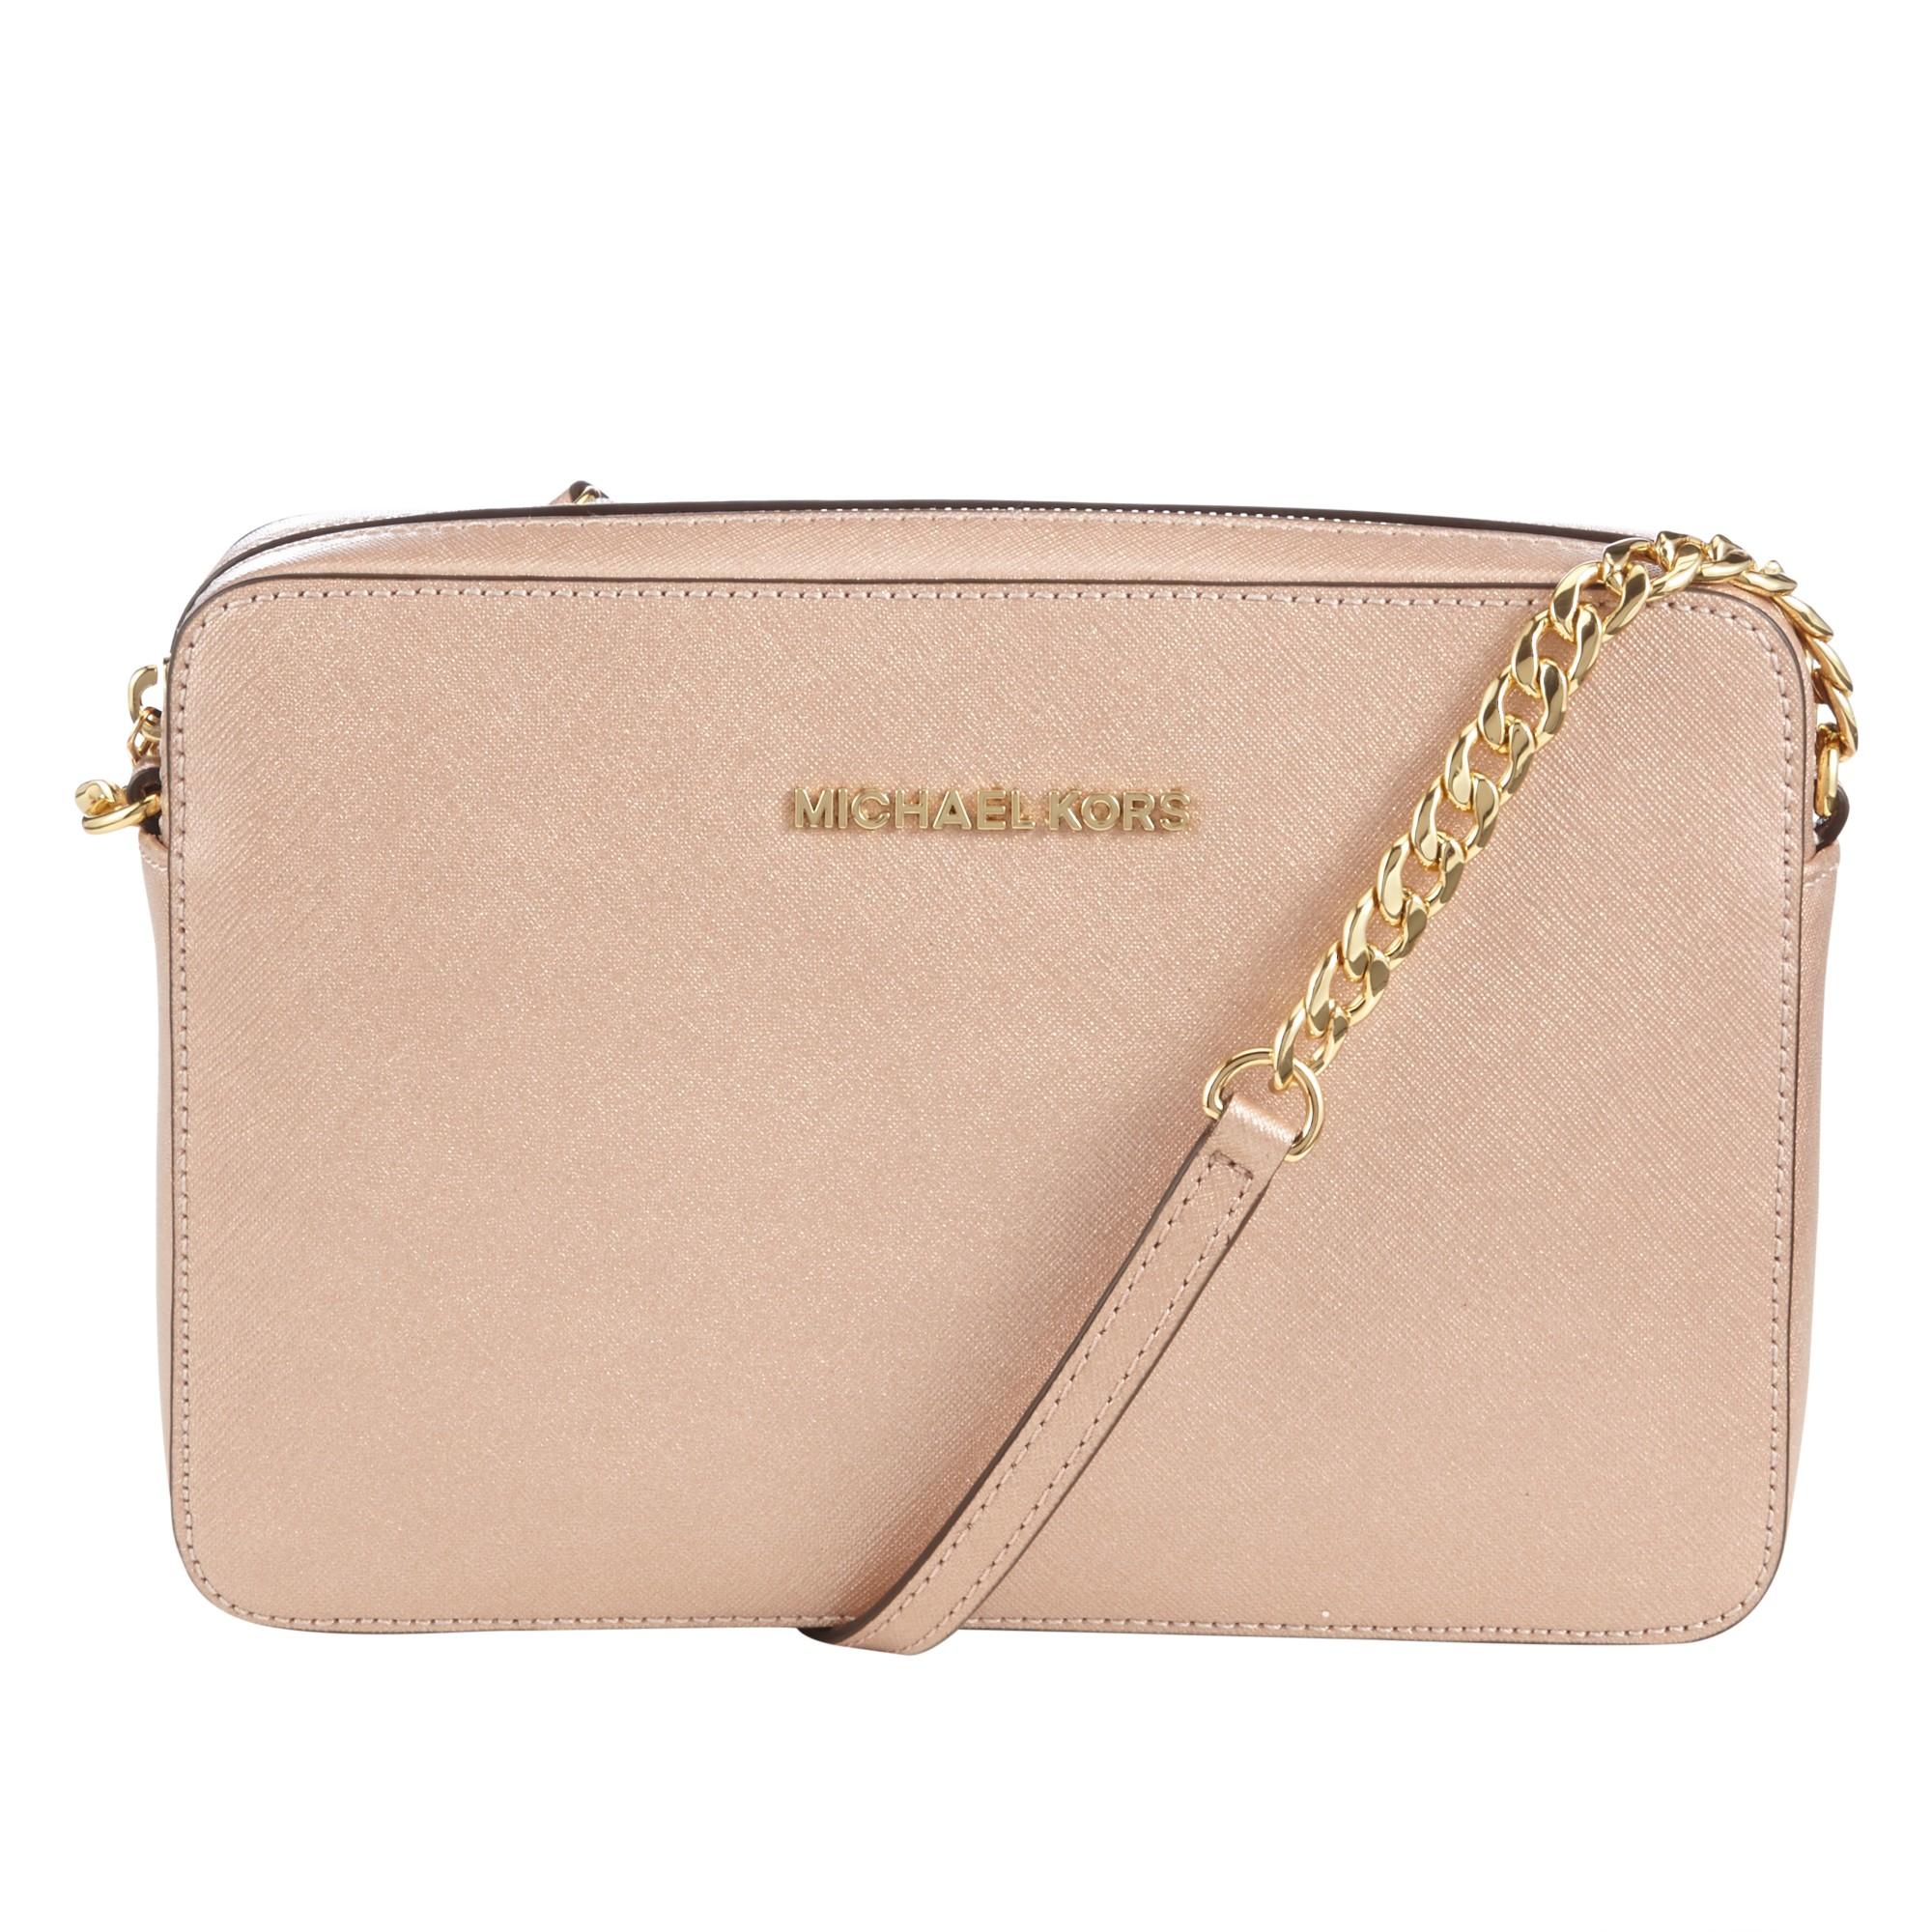 Dkny Leather Travel Bag